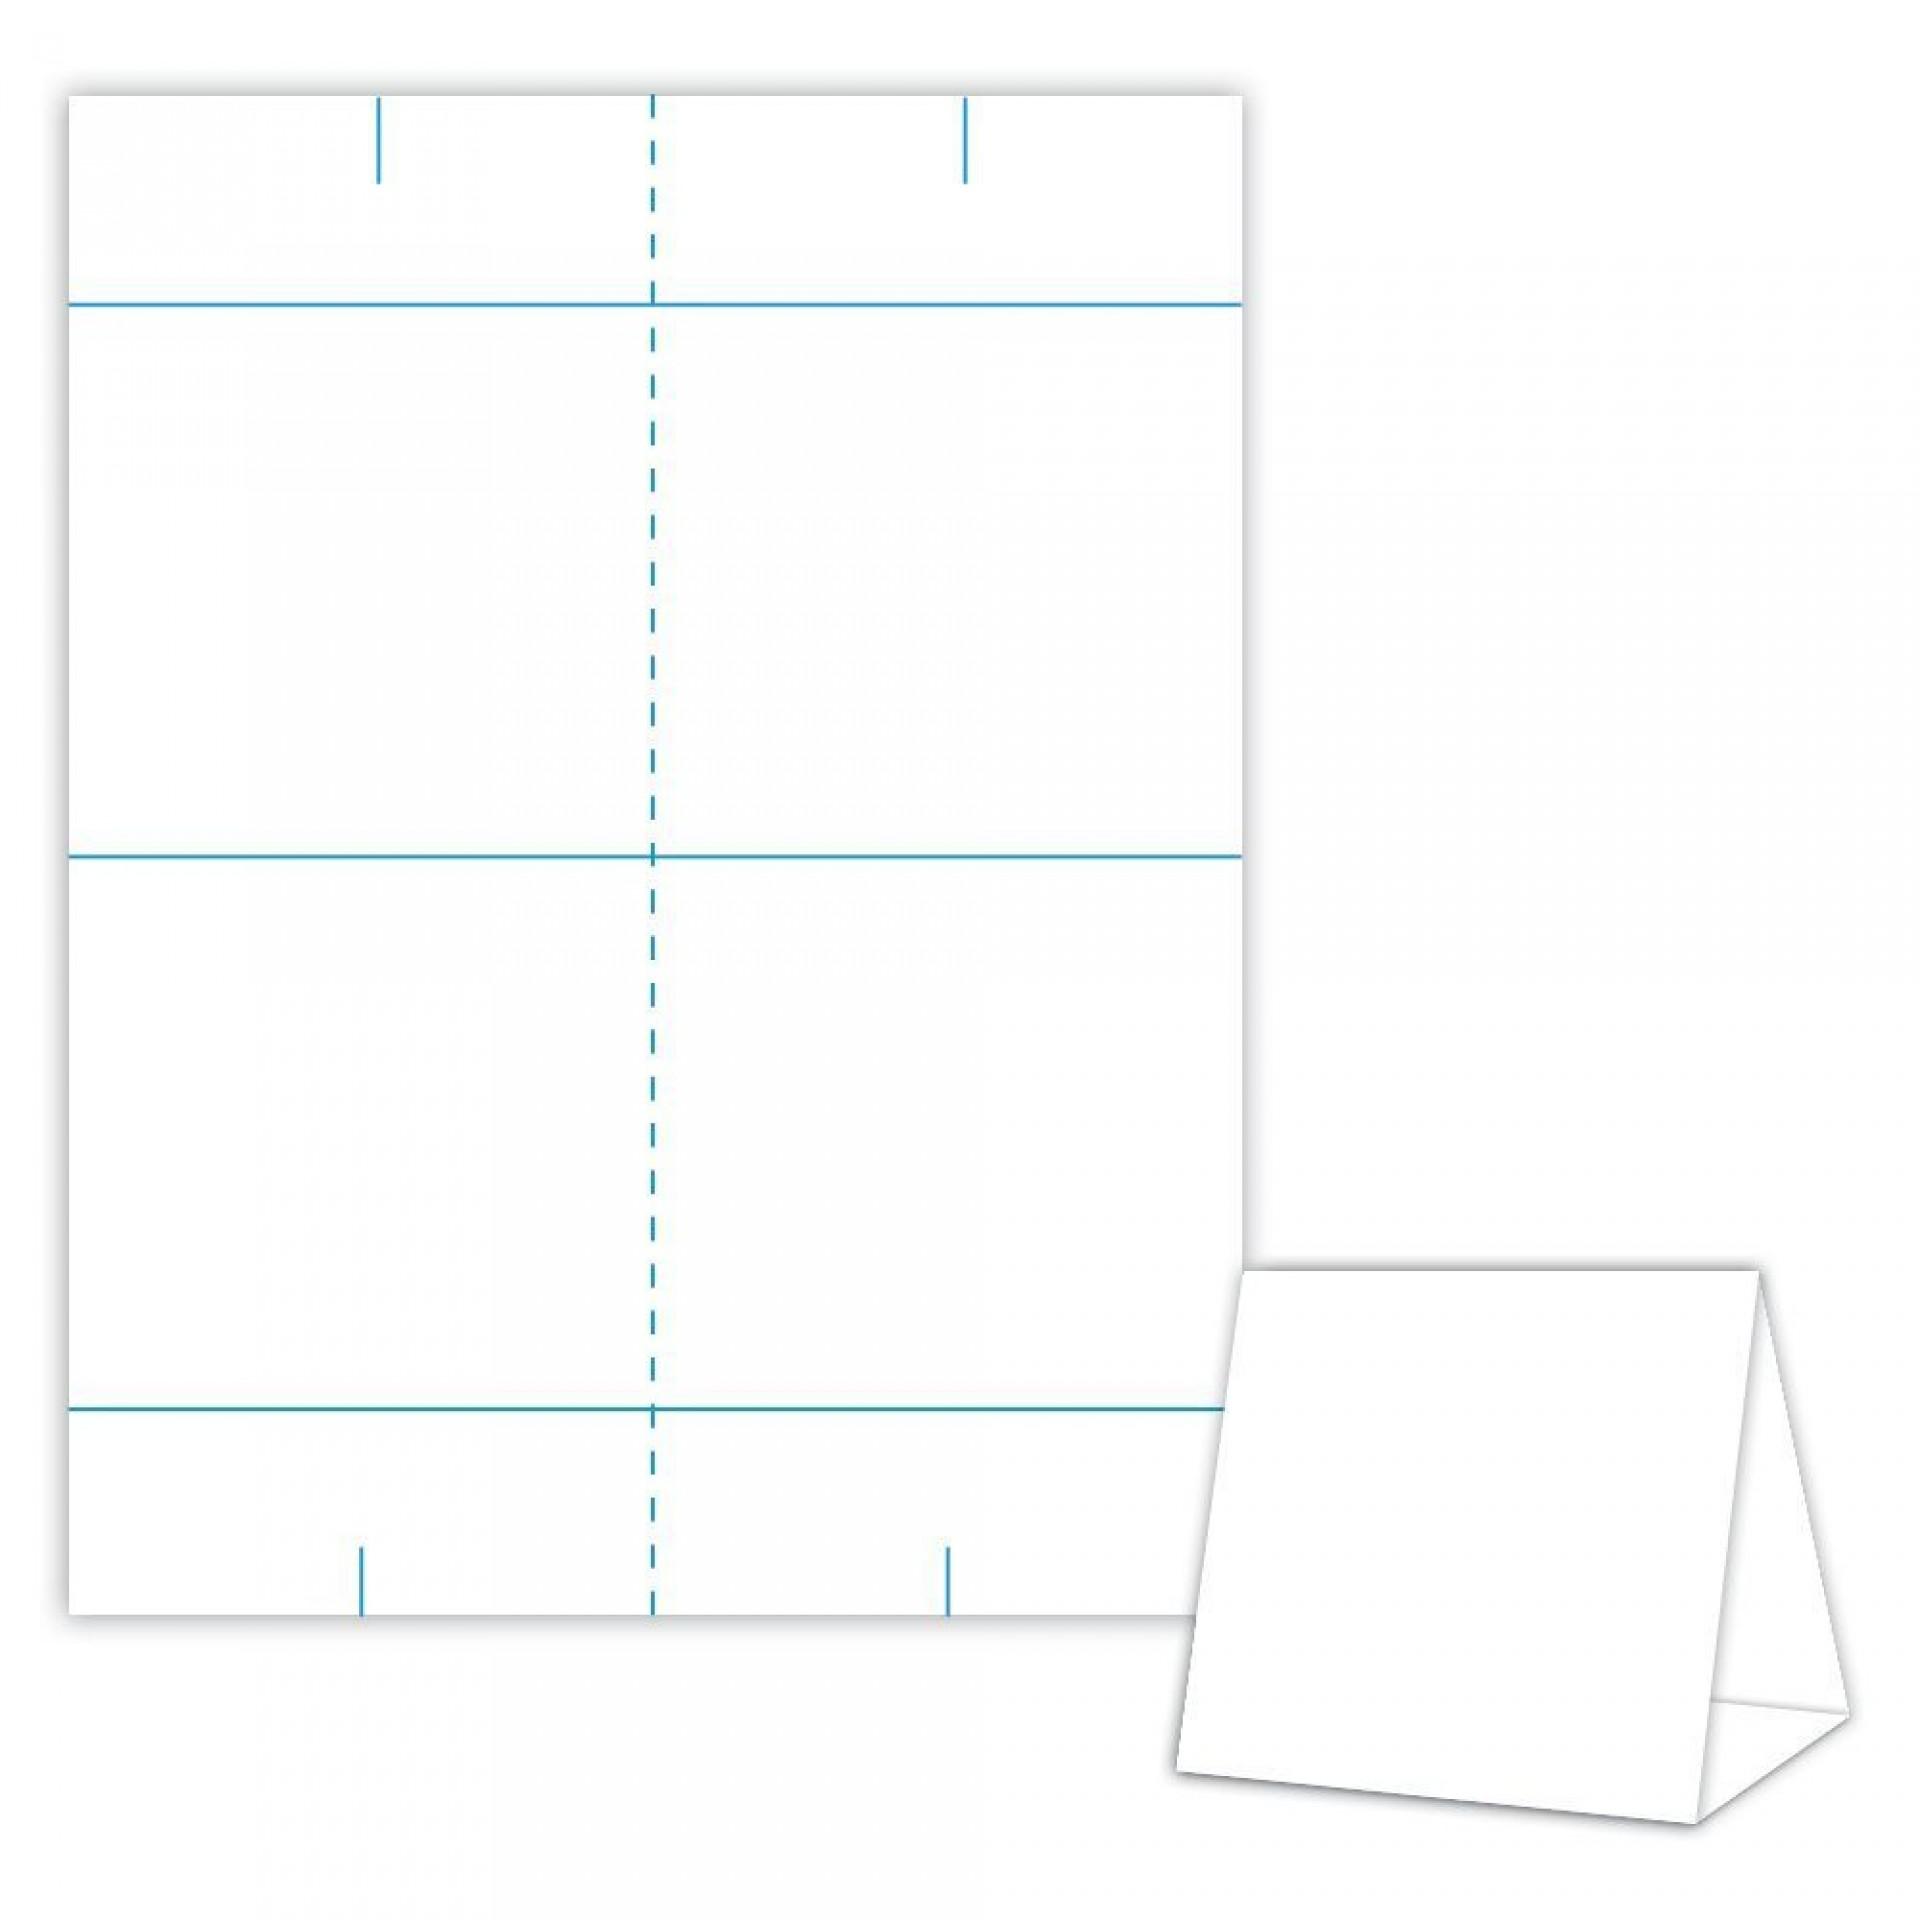 001 Impressive Tri Fold Table Tent Template Idea  Free Word1920